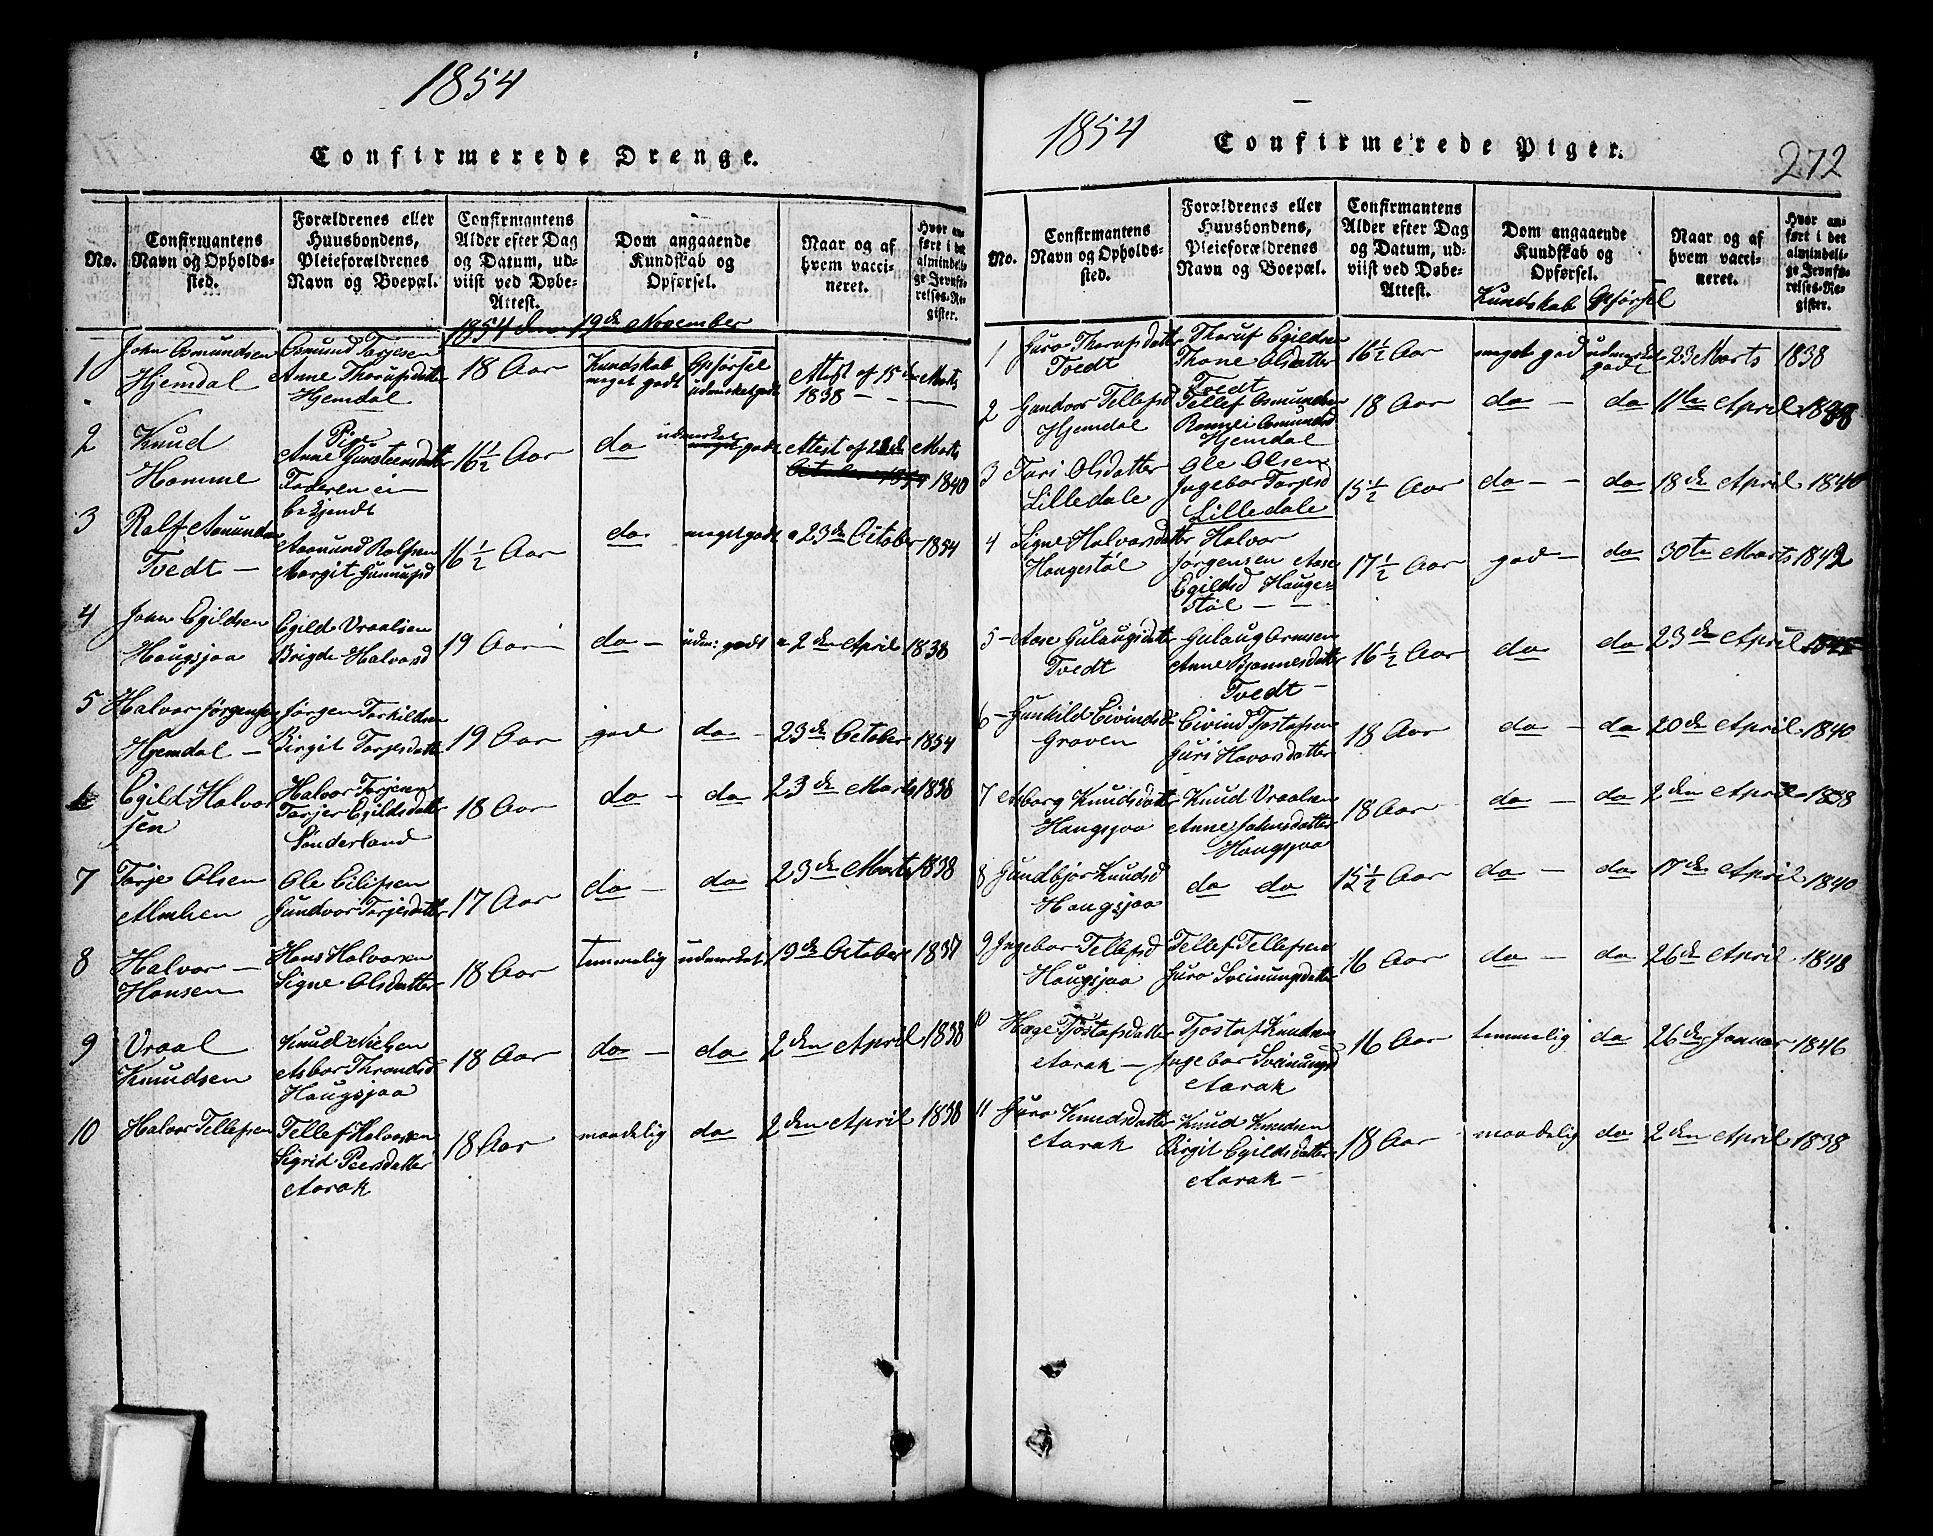 SAKO, Nissedal kirkebøker, G/Gb/L0001: Klokkerbok nr. II 1, 1814-1862, s. 272